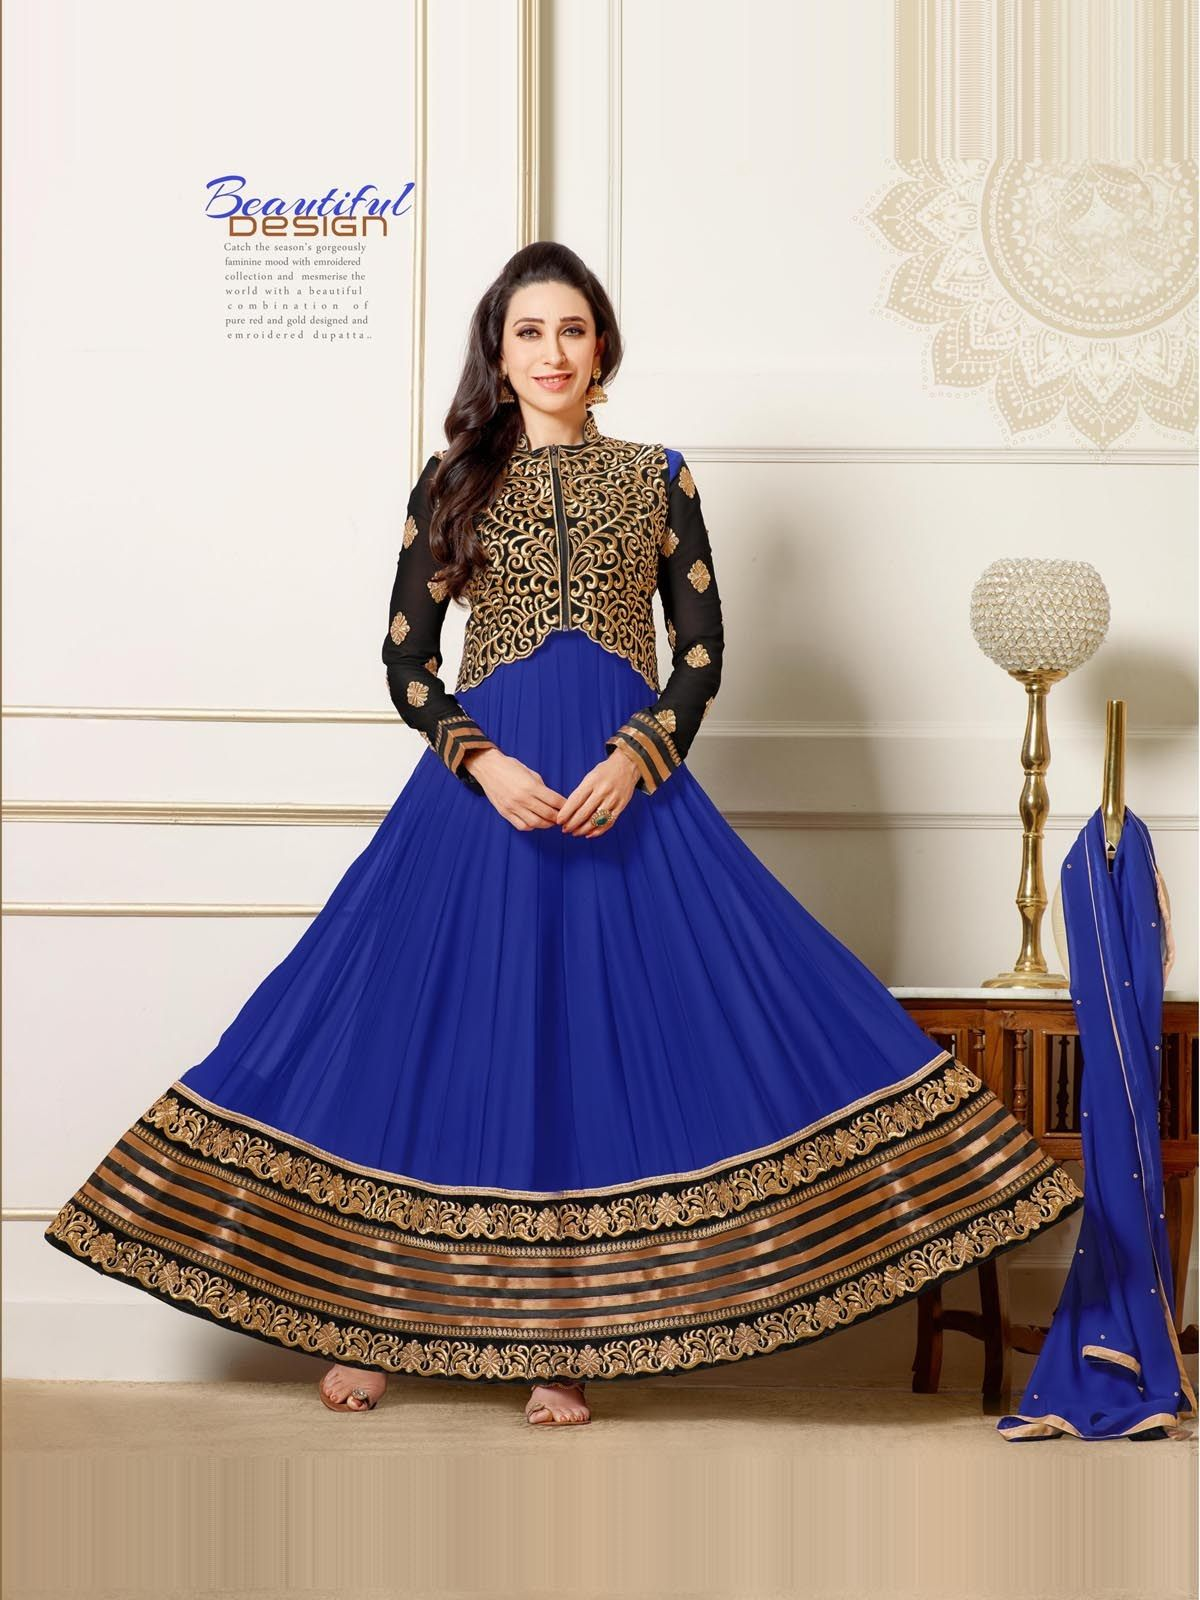 Online Shopping for Karishma Kapoor Blue Deigner Floor   Salwar Suit   Unique Indian Products by Whatshop Enterprise - MWHAT32553515830